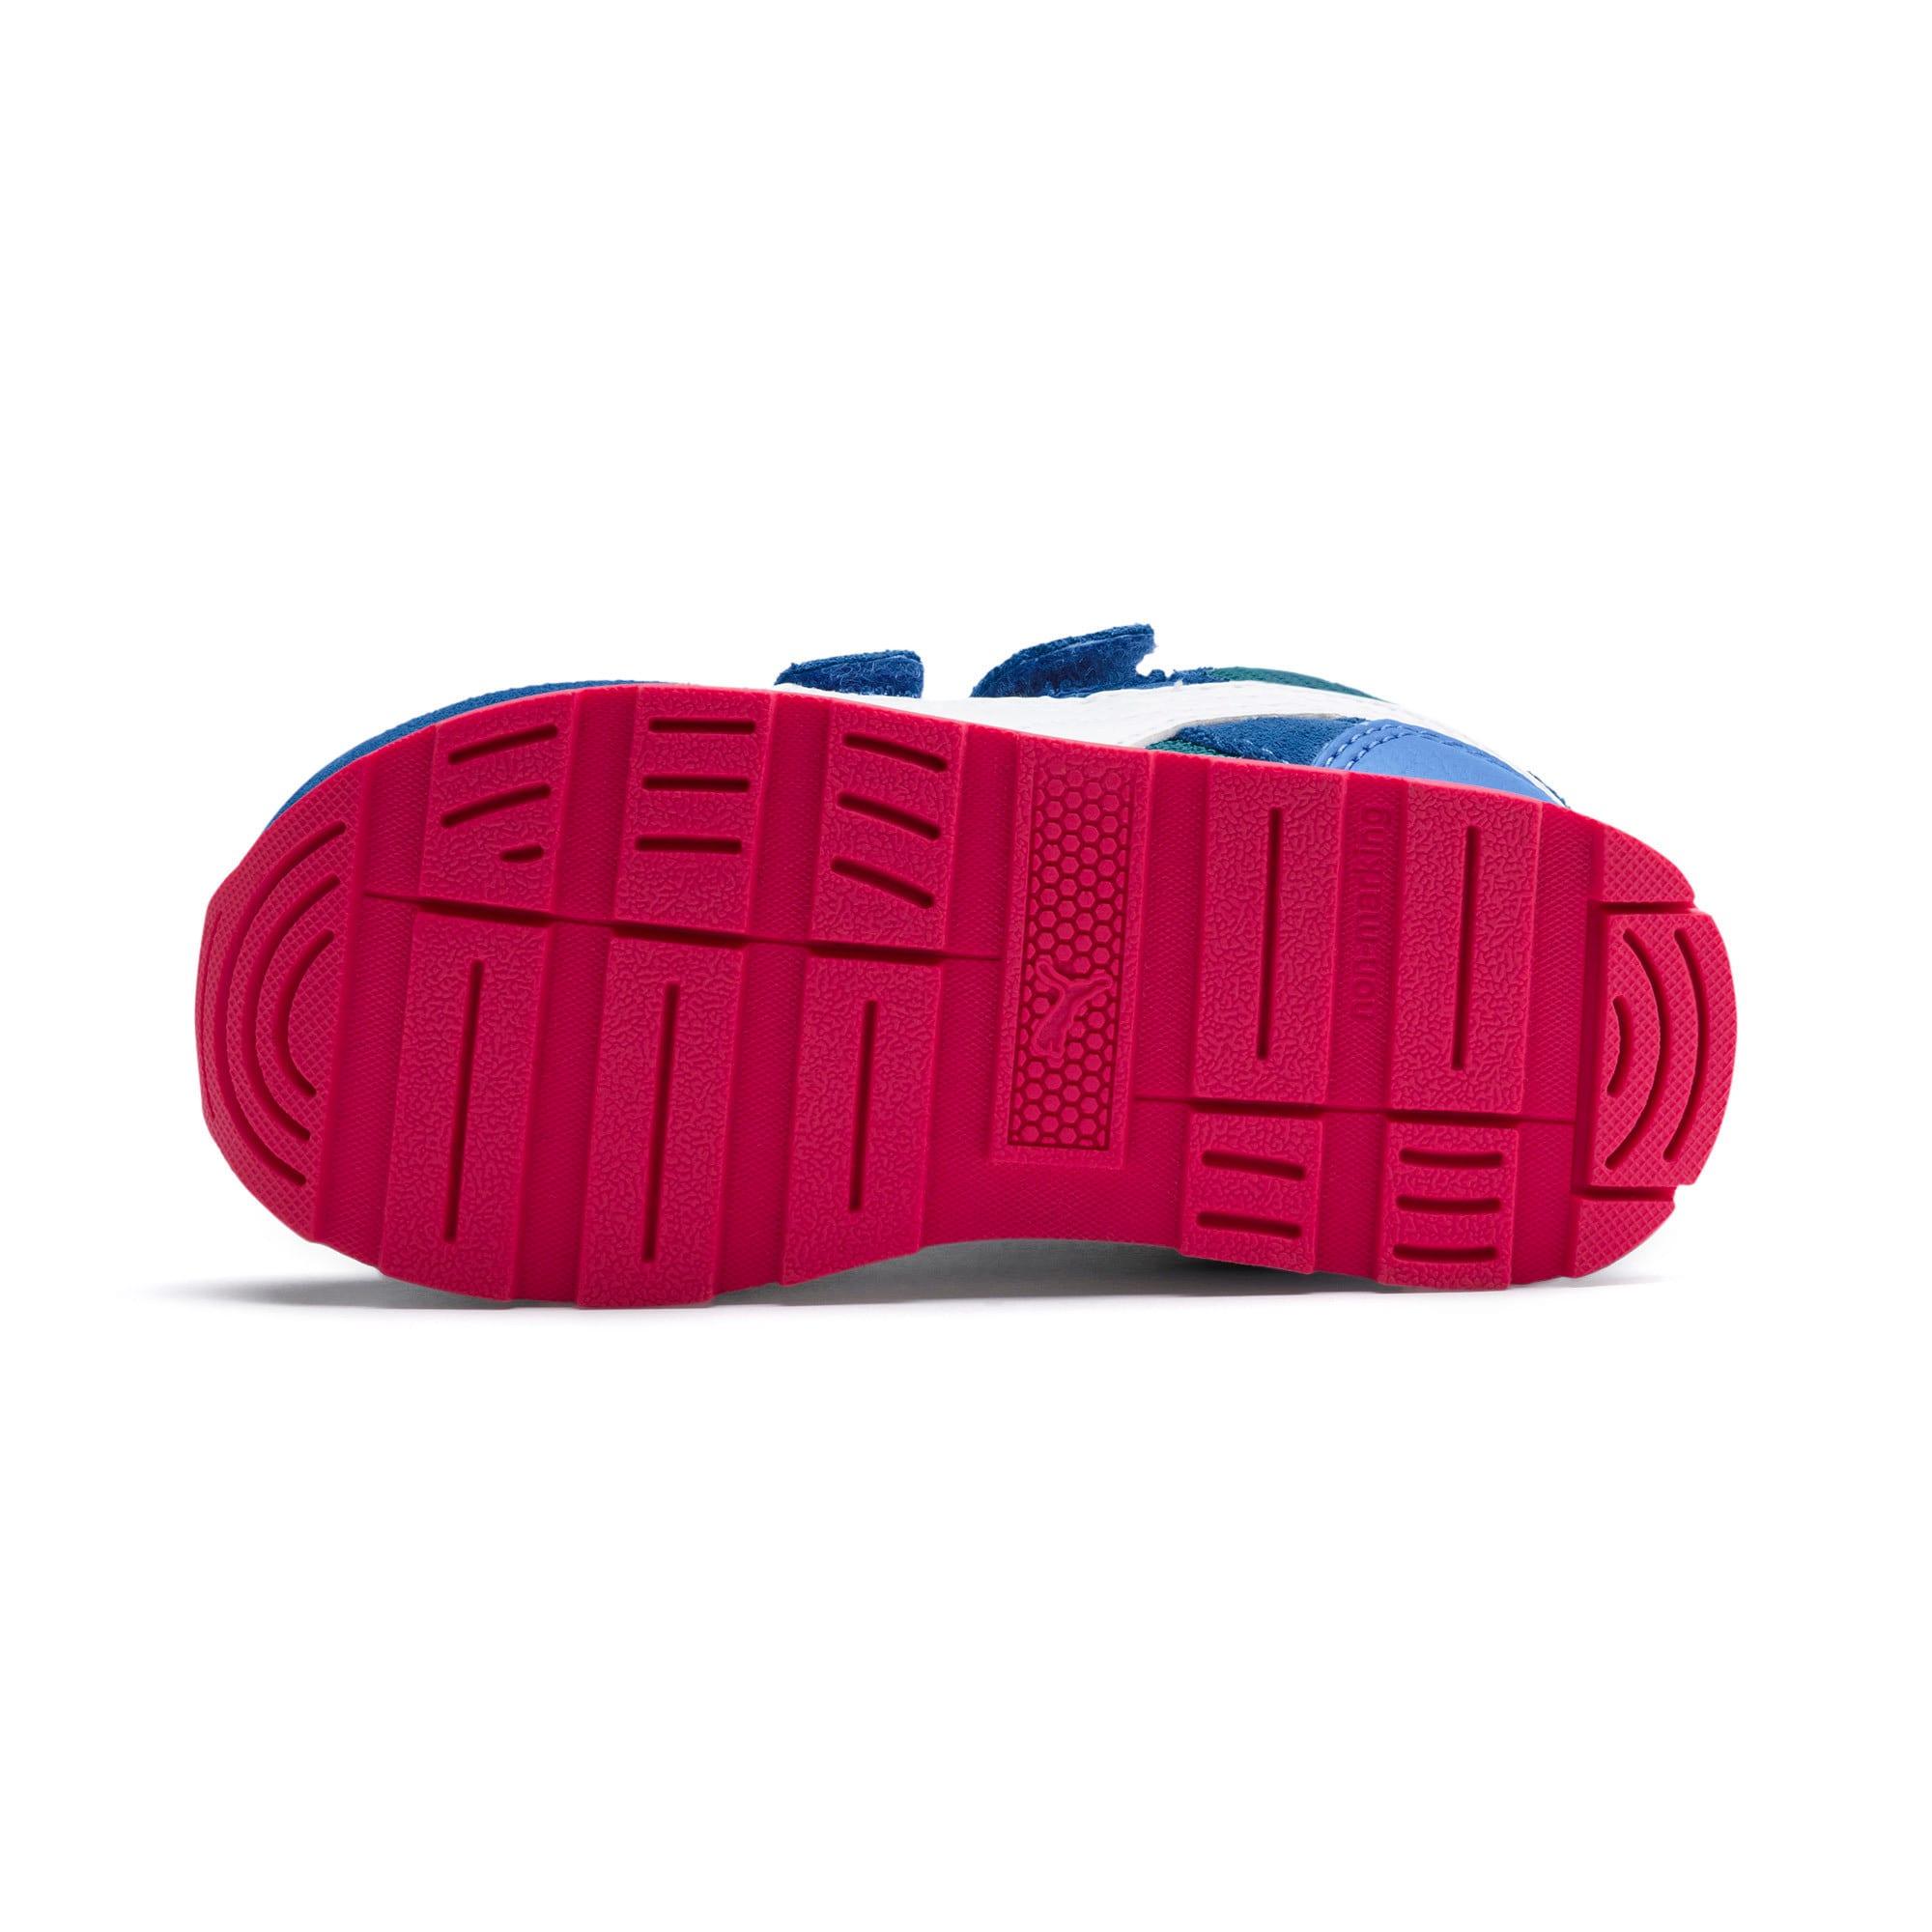 Thumbnail 4 of Vista Toddler Shoes, Ultramarine-Puma White, medium